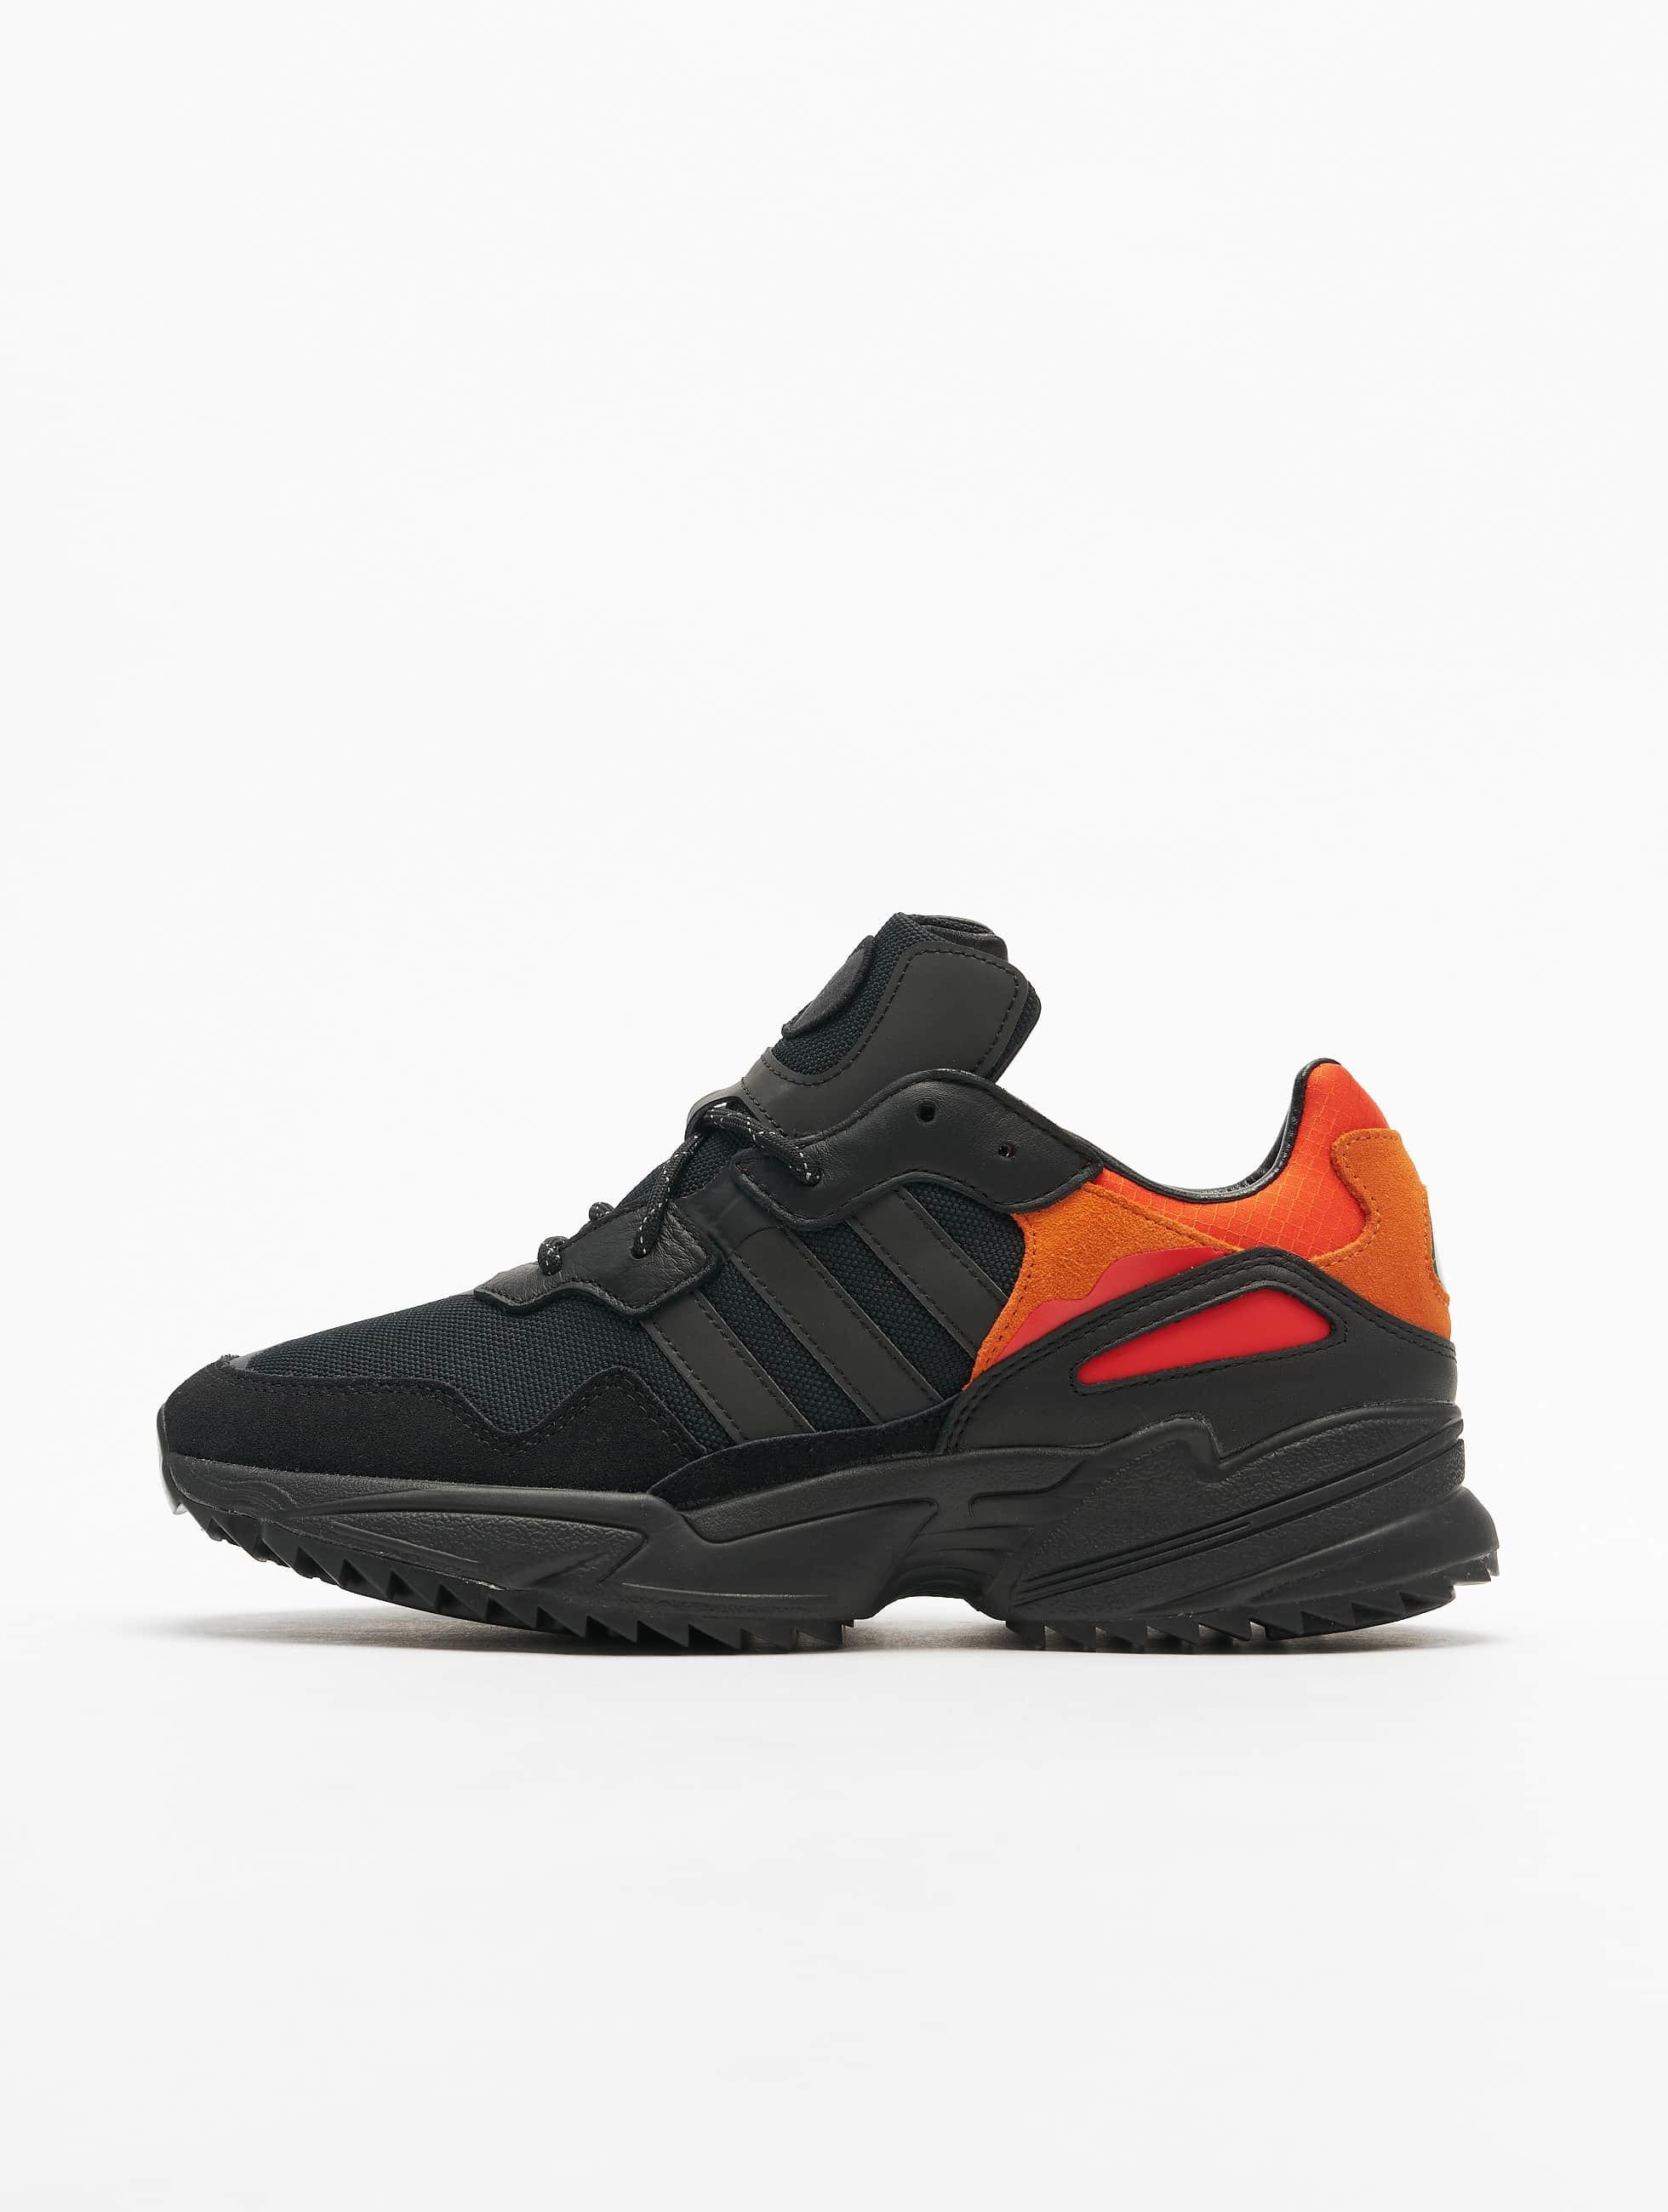 Adidas Originals Yung 96 Trail Sneakers Core Black